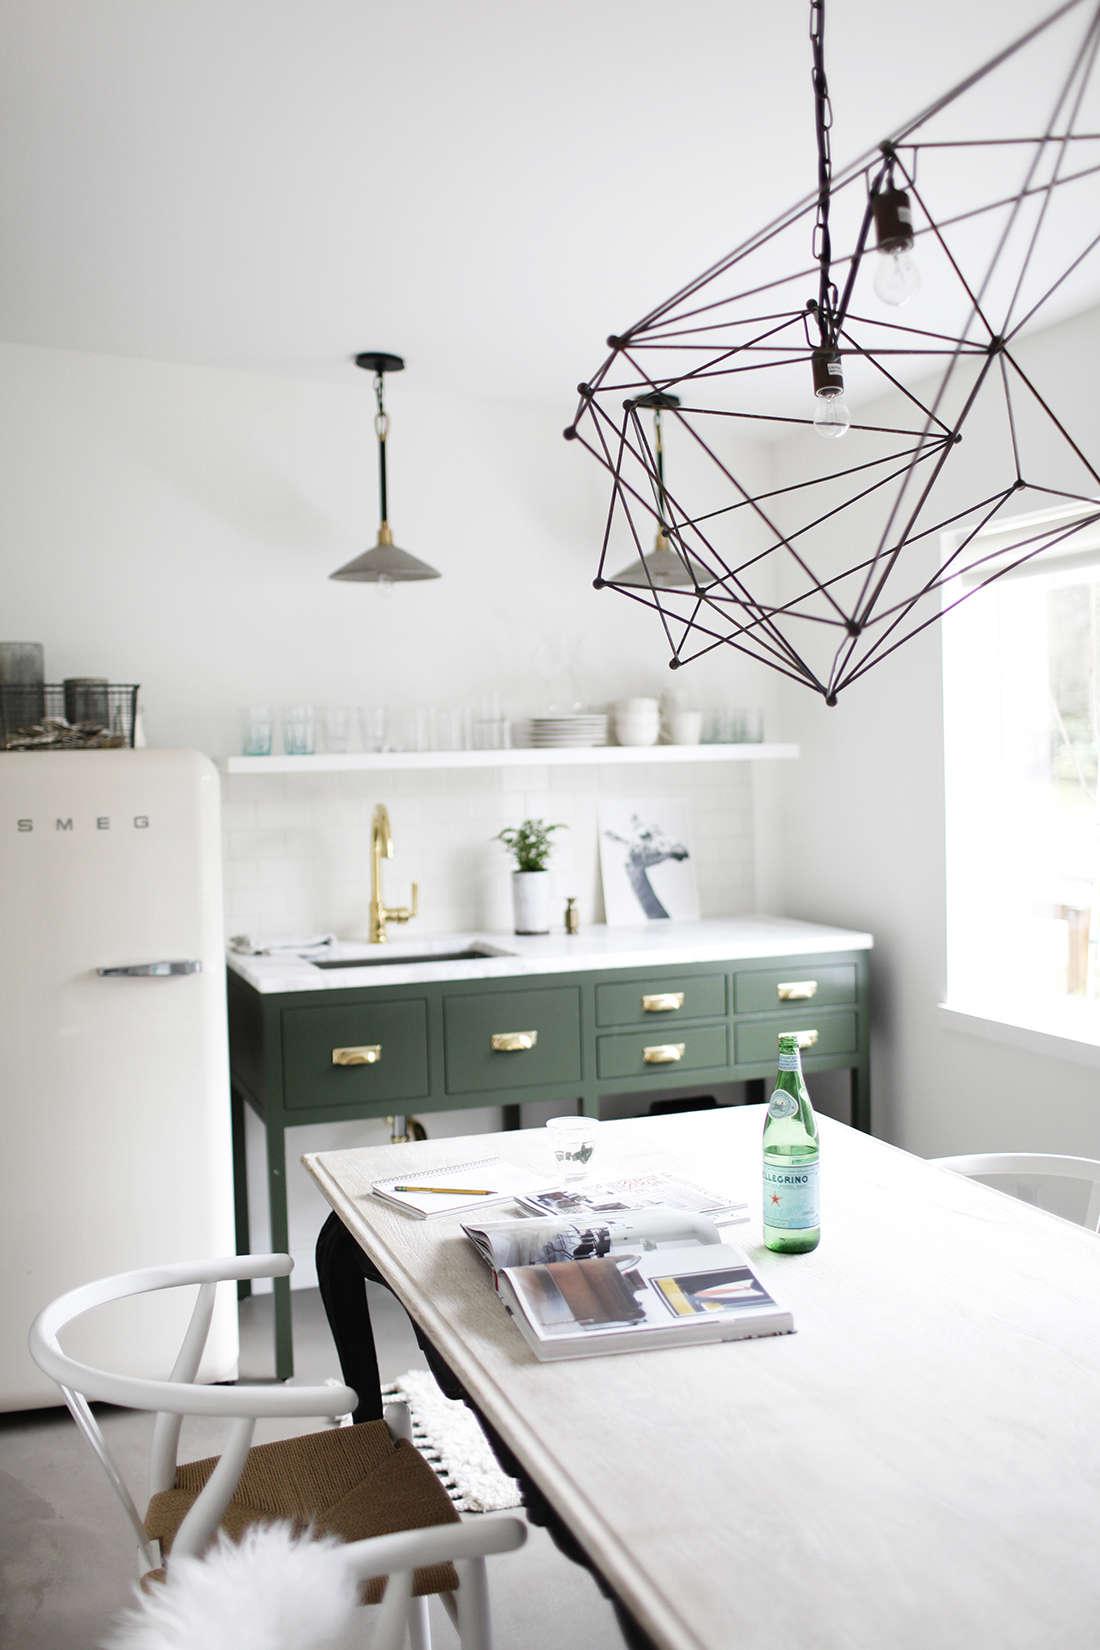 h2 design + build office in seattle | remodelista 14